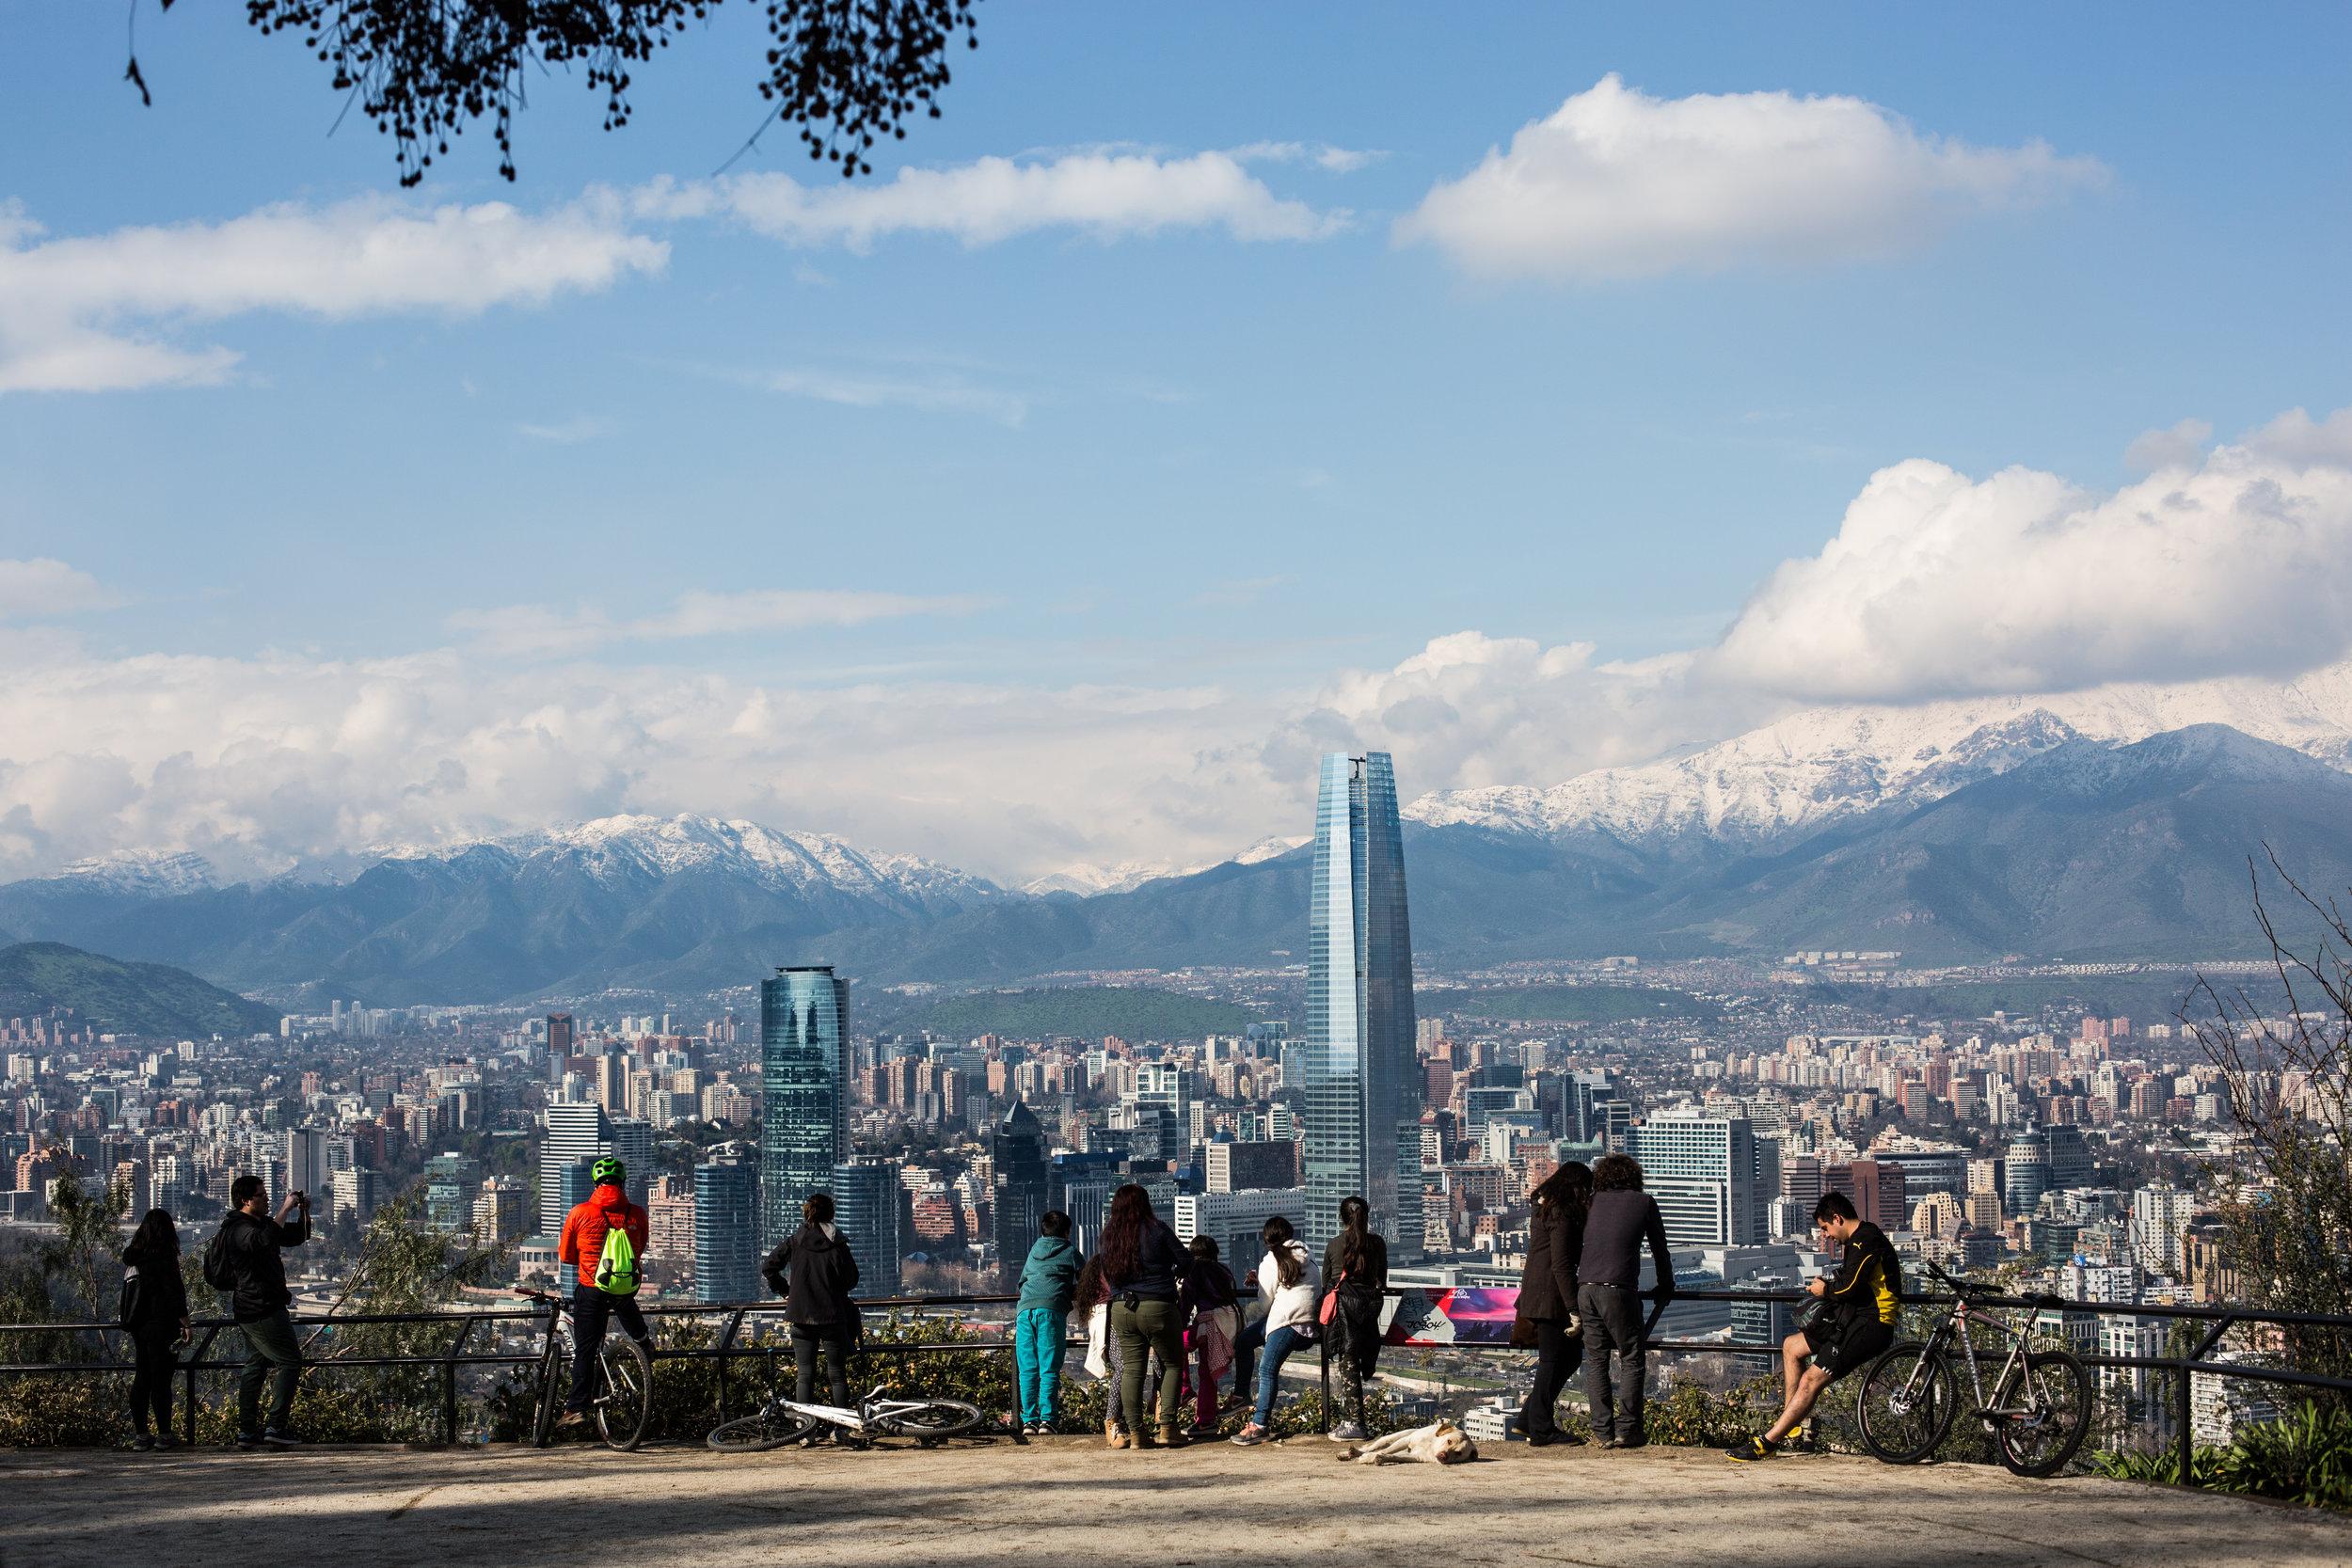 Chile_Santiago_2017_3-2.JPG